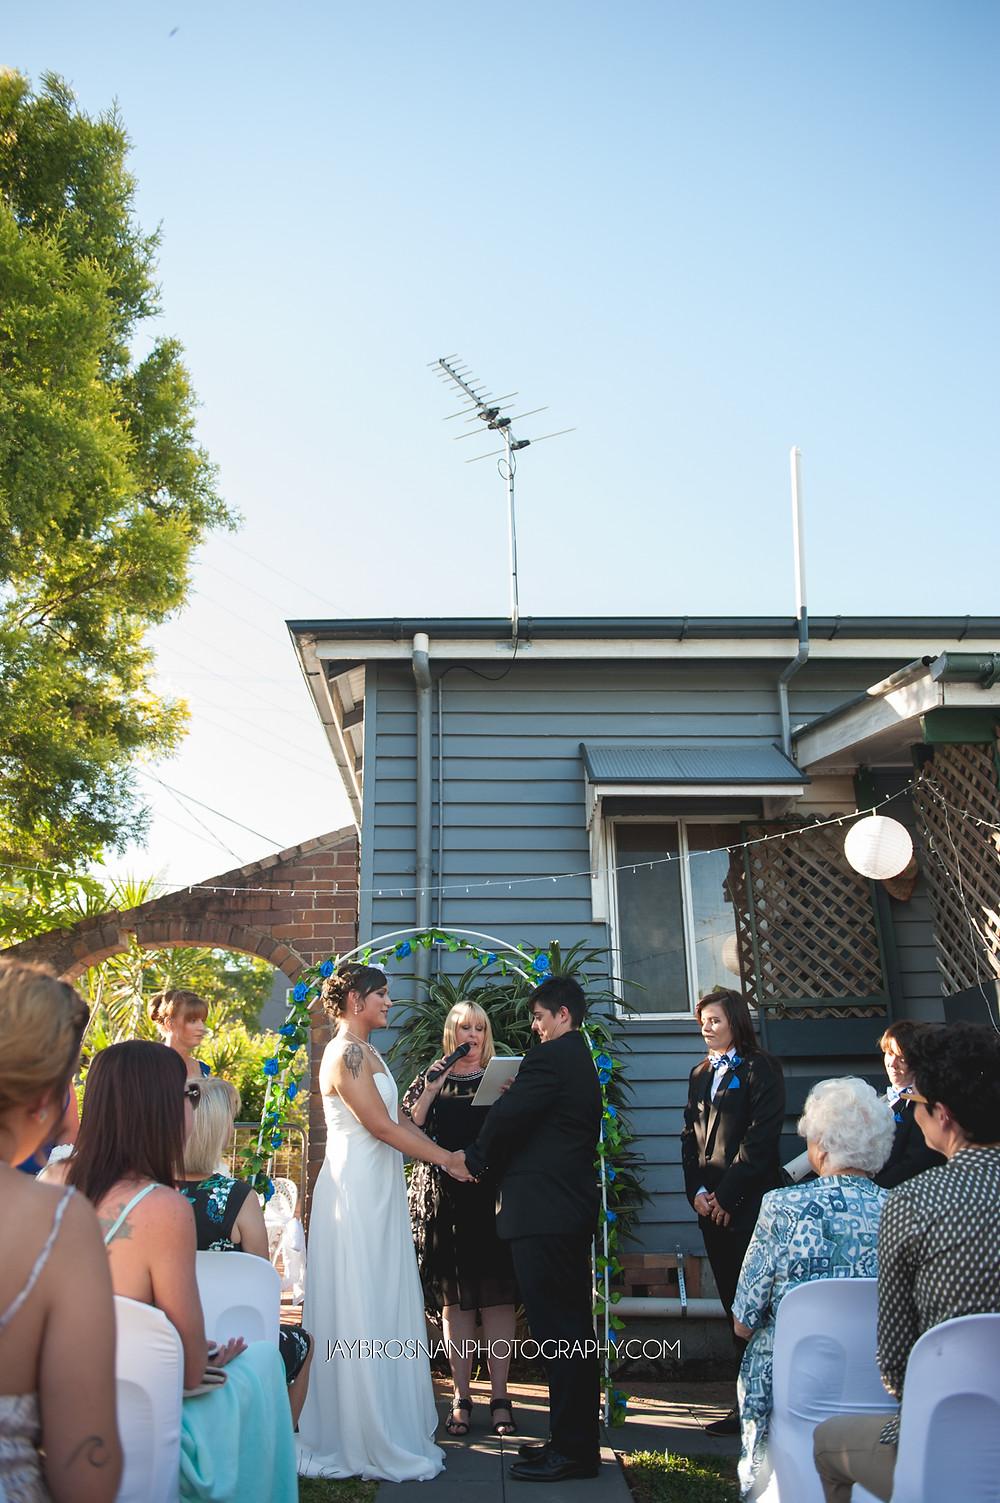 Jay Brosnan Photography | Sunshine Coast Wedding Photographer | Brisbane Wedding Photographer | Wedding Photographer | Portrait Photographer | Engagement Photographer | Wedding | Photographer | Backyard Wedding | Lesbian Wedding | Gay Wedding | Married | Love